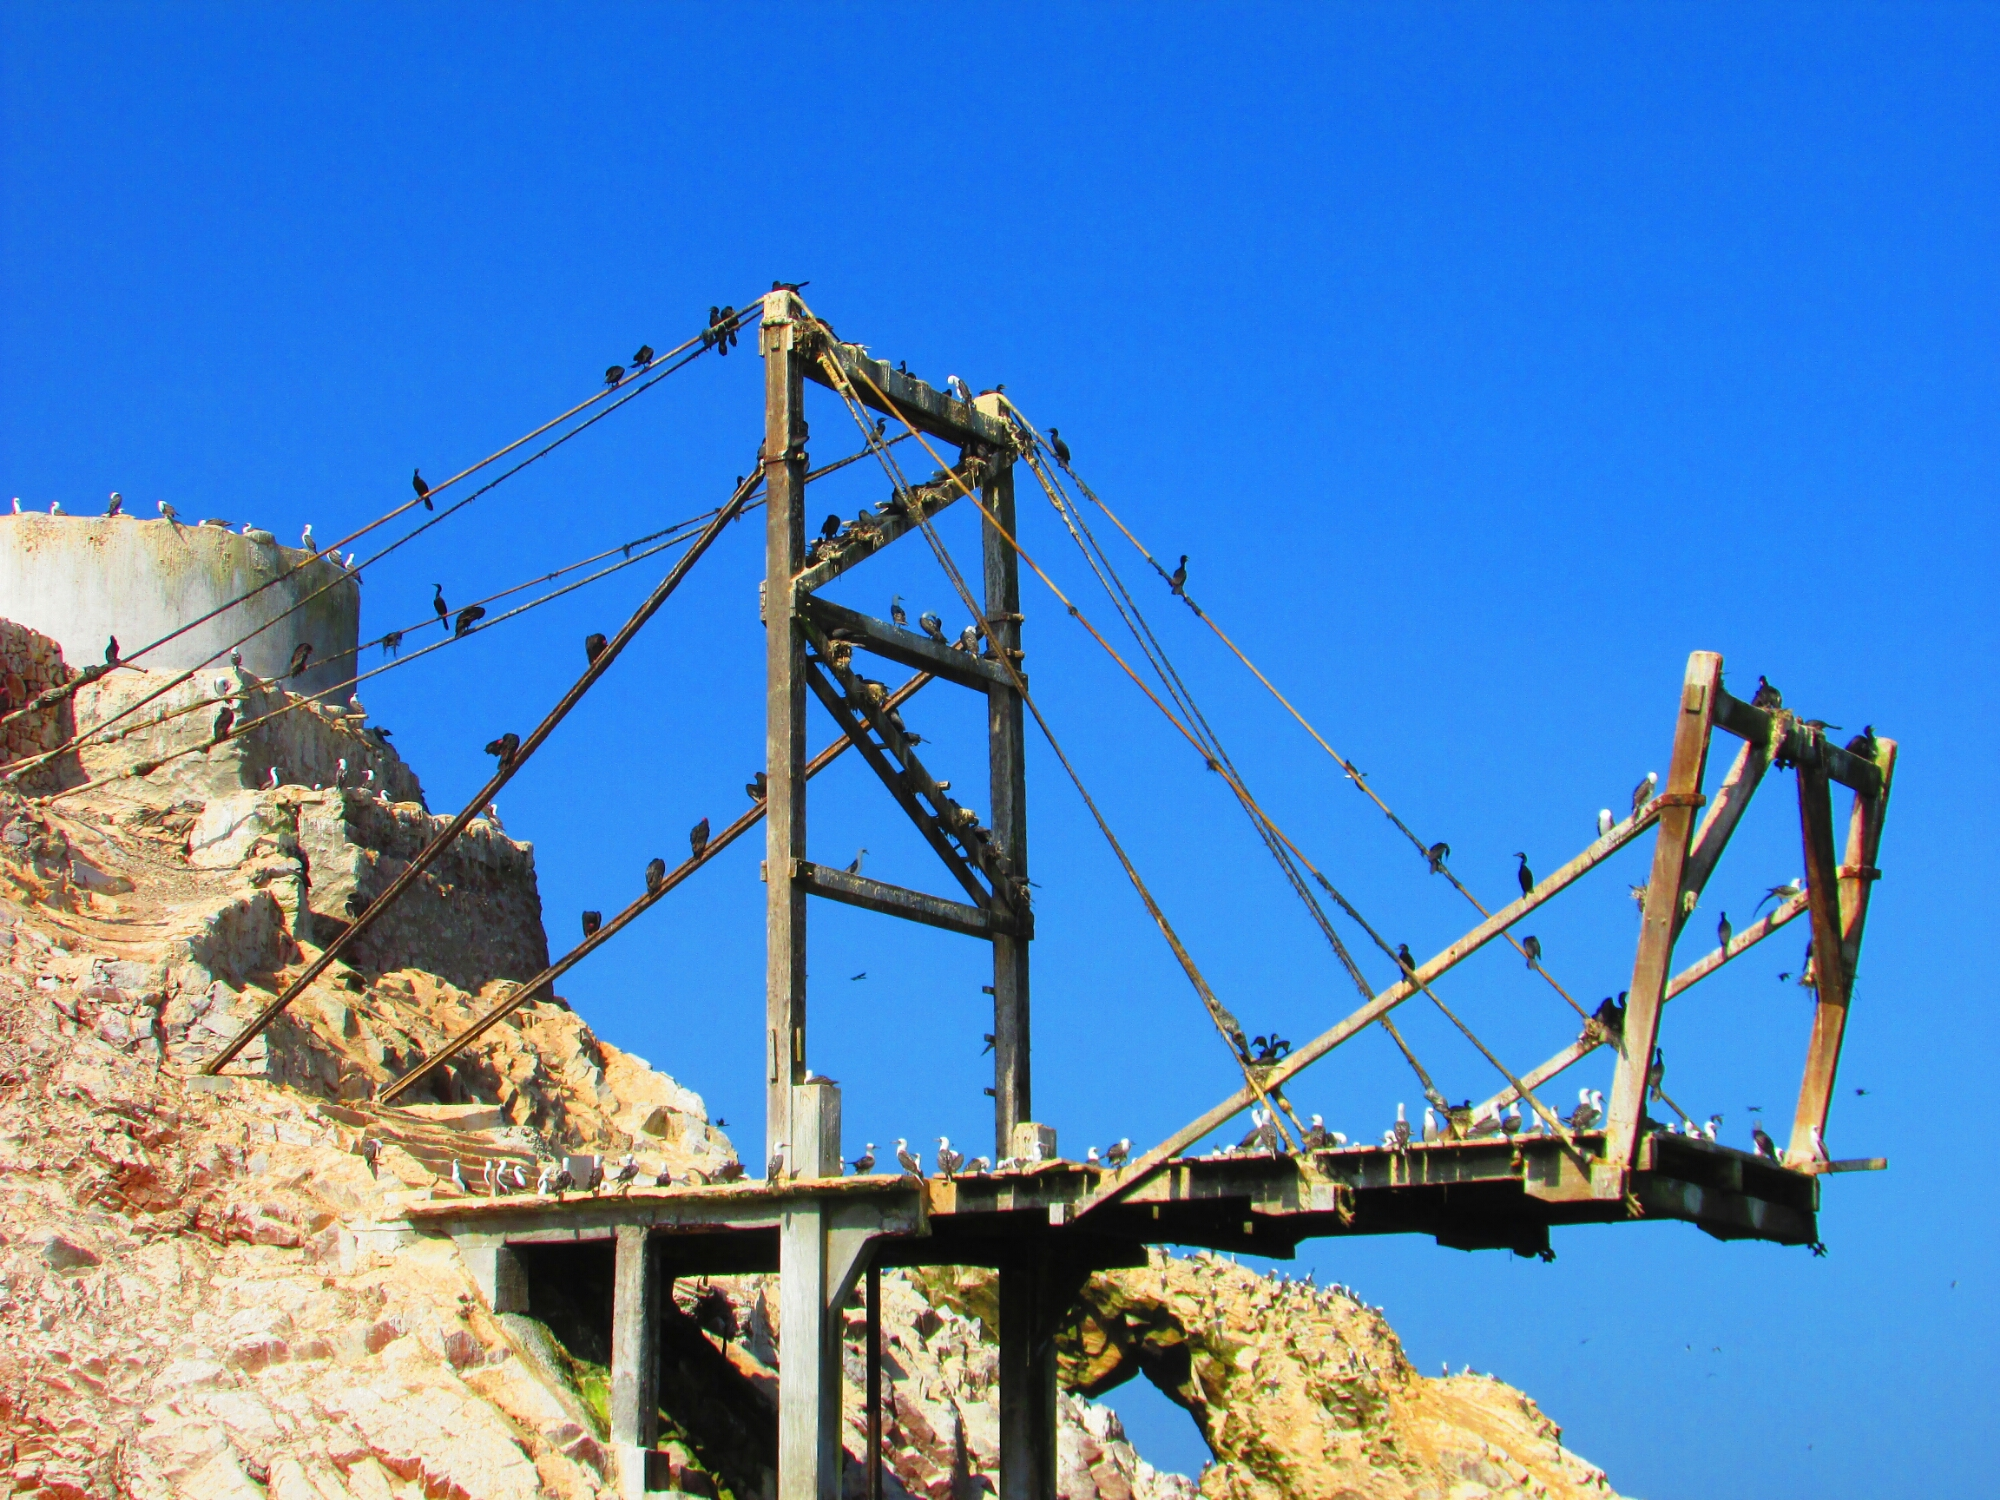 estructura para recoger guano en Isla Ballesta en Paracas, Perú